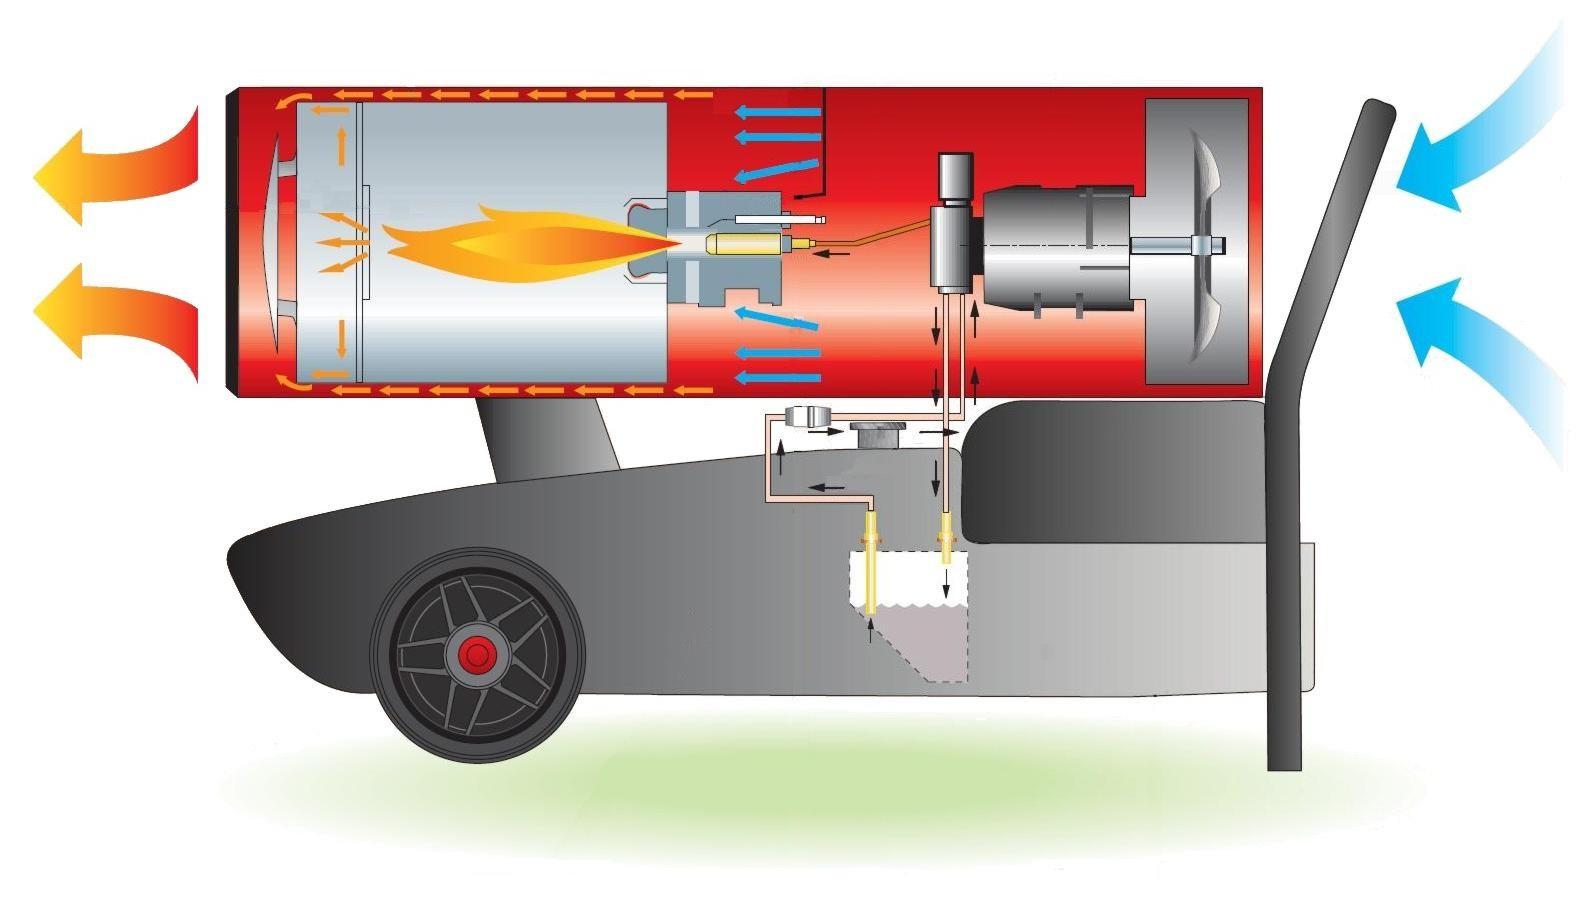 BM2 GE - schema de functionare